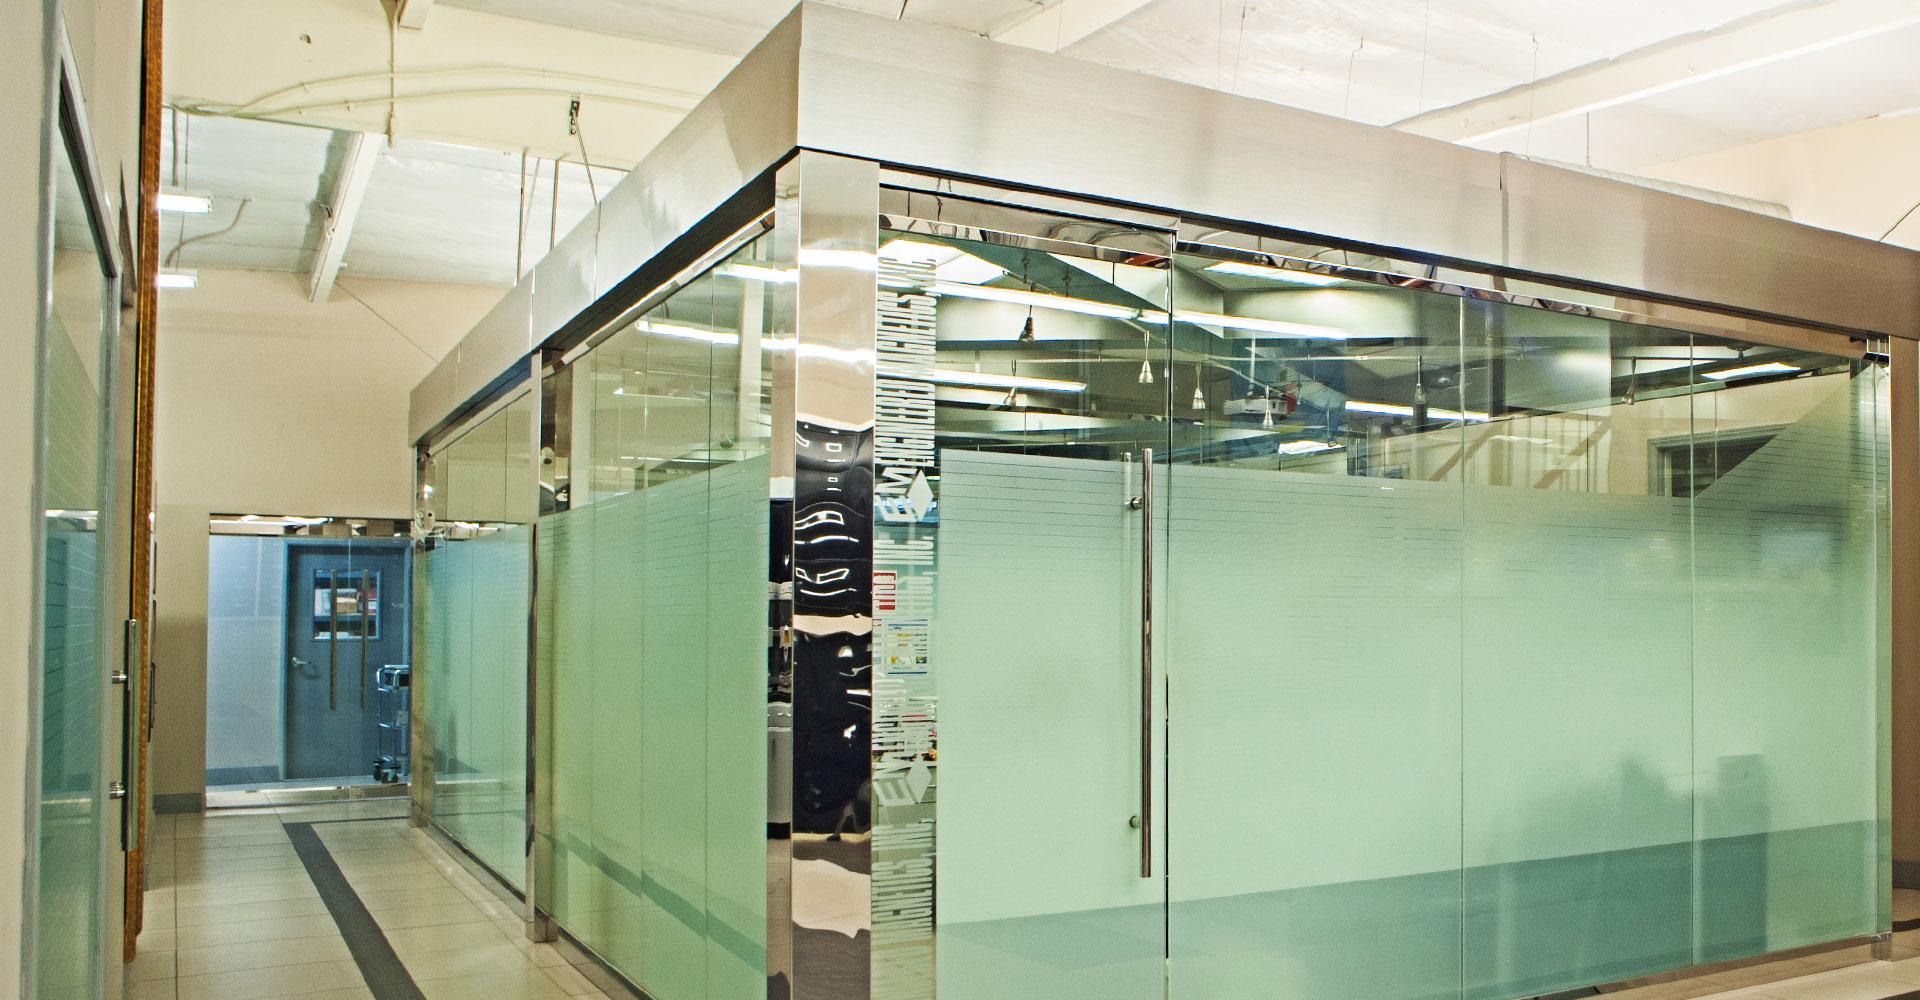 Engineered Magnetics - Aerospace Component Manufacturer: Facility Slide 8